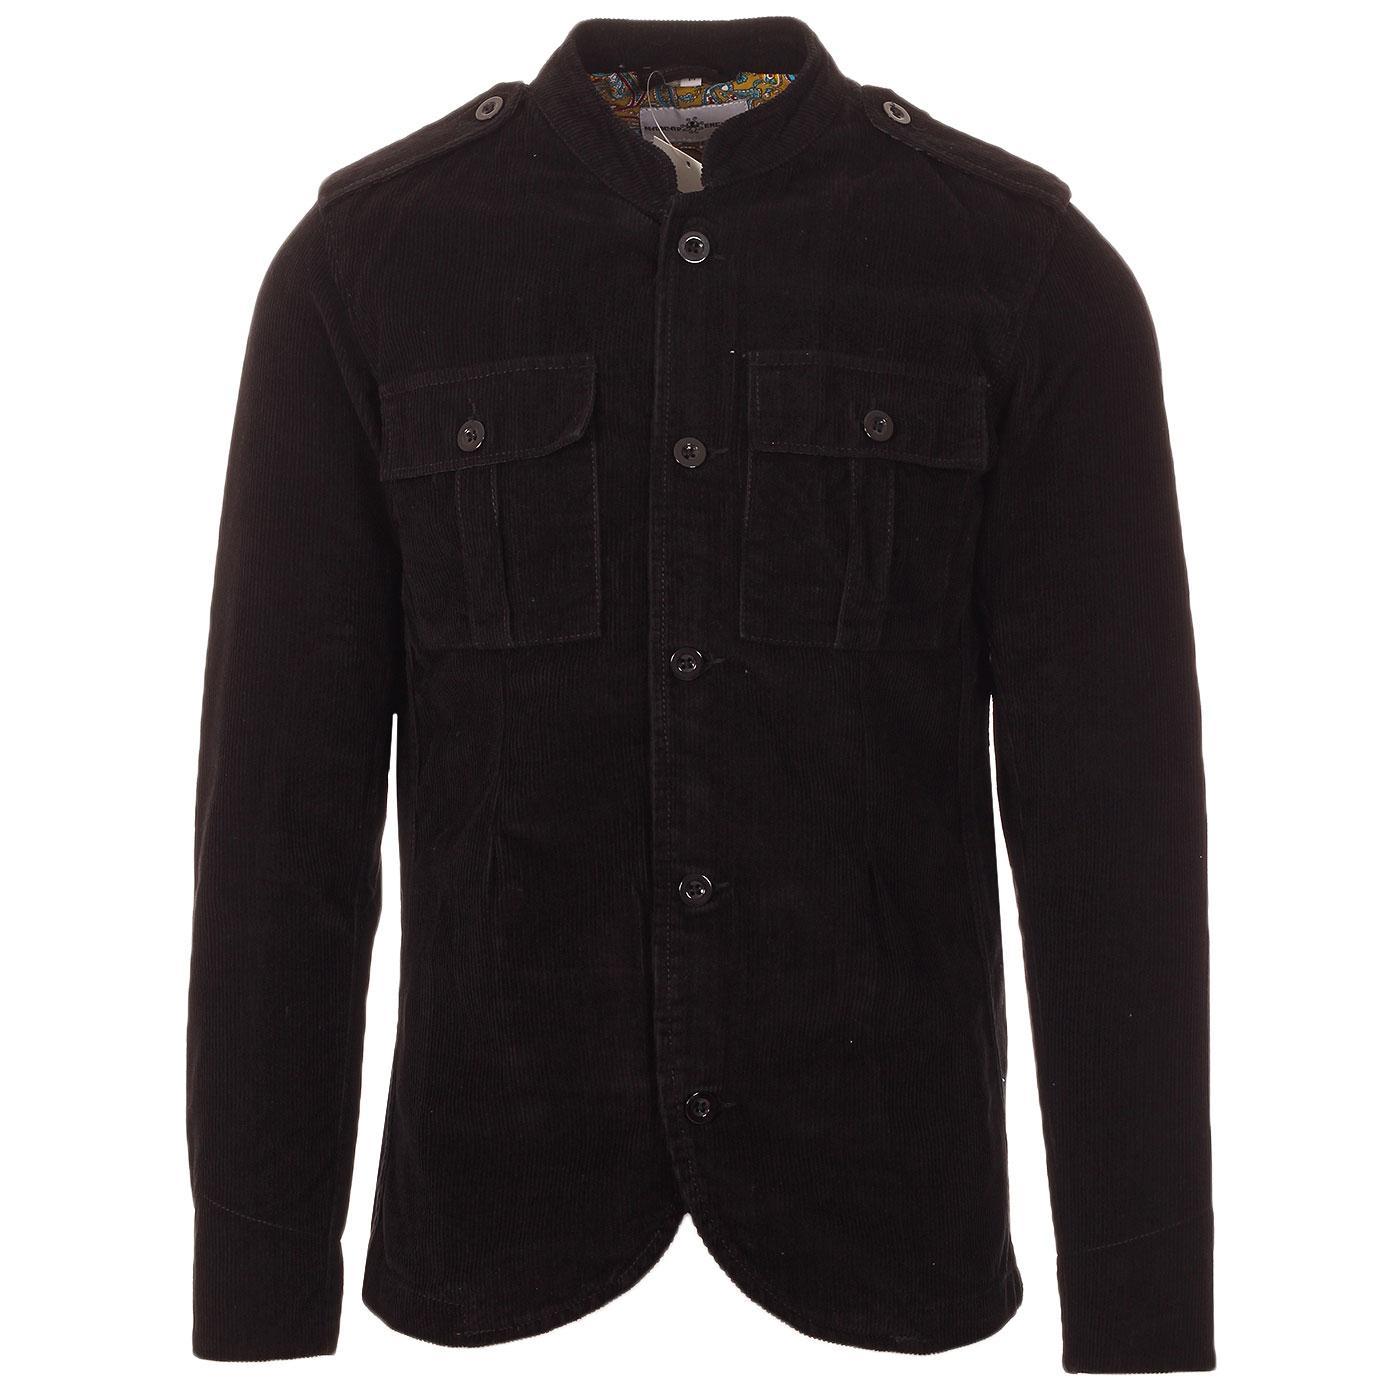 Madcap England Pepper Men's 60s Mod Cord Tunic Jacket in Black